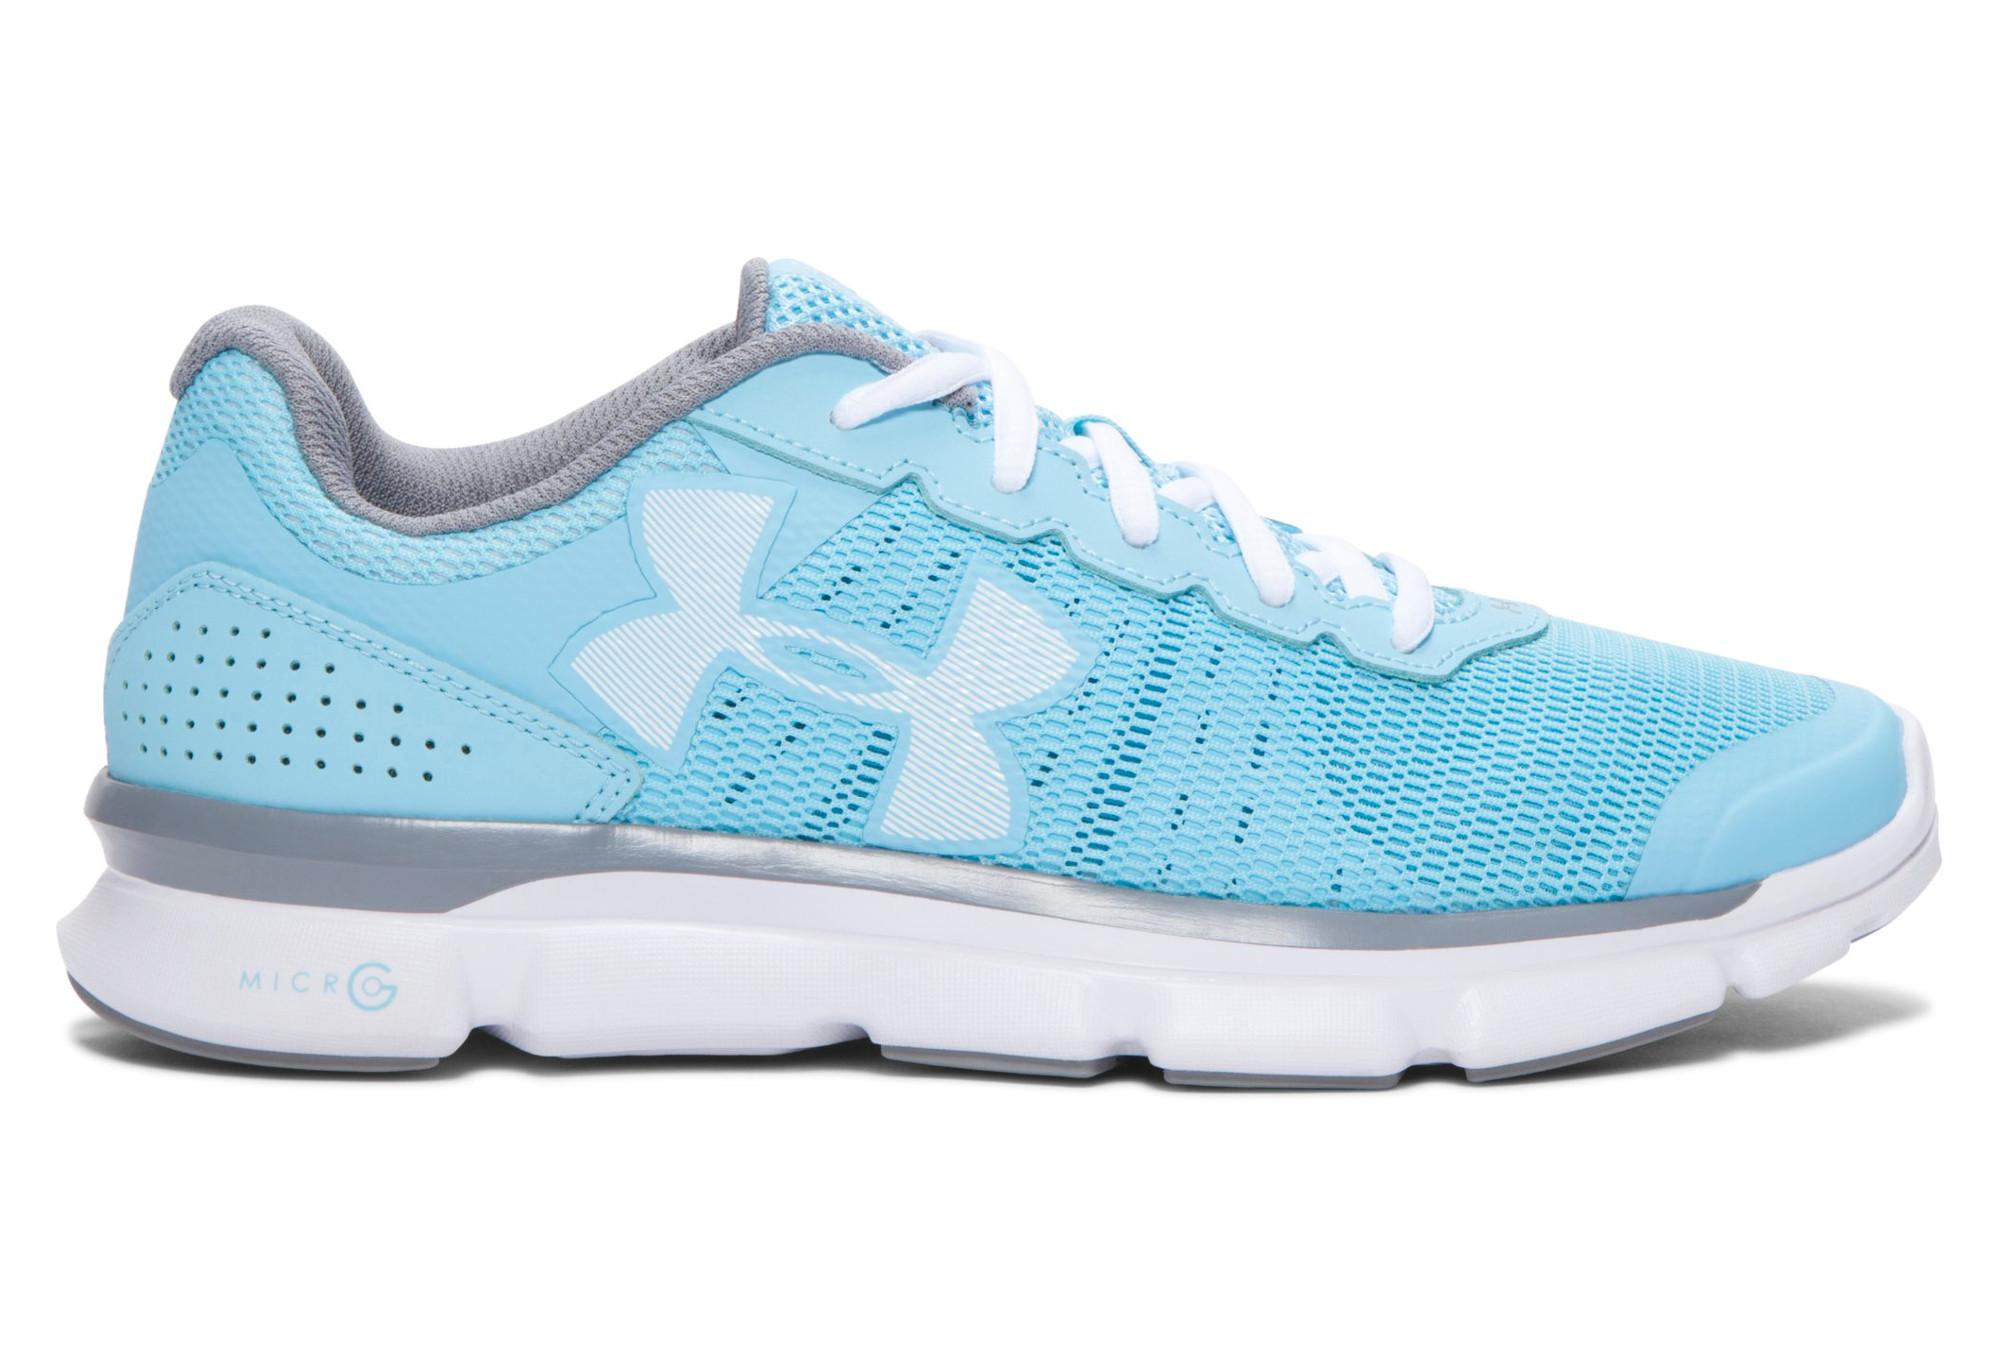 099412640f7 Zapatillas Under Armour MICRO G SPEED SWIFT para Mujer Azul / Blanco